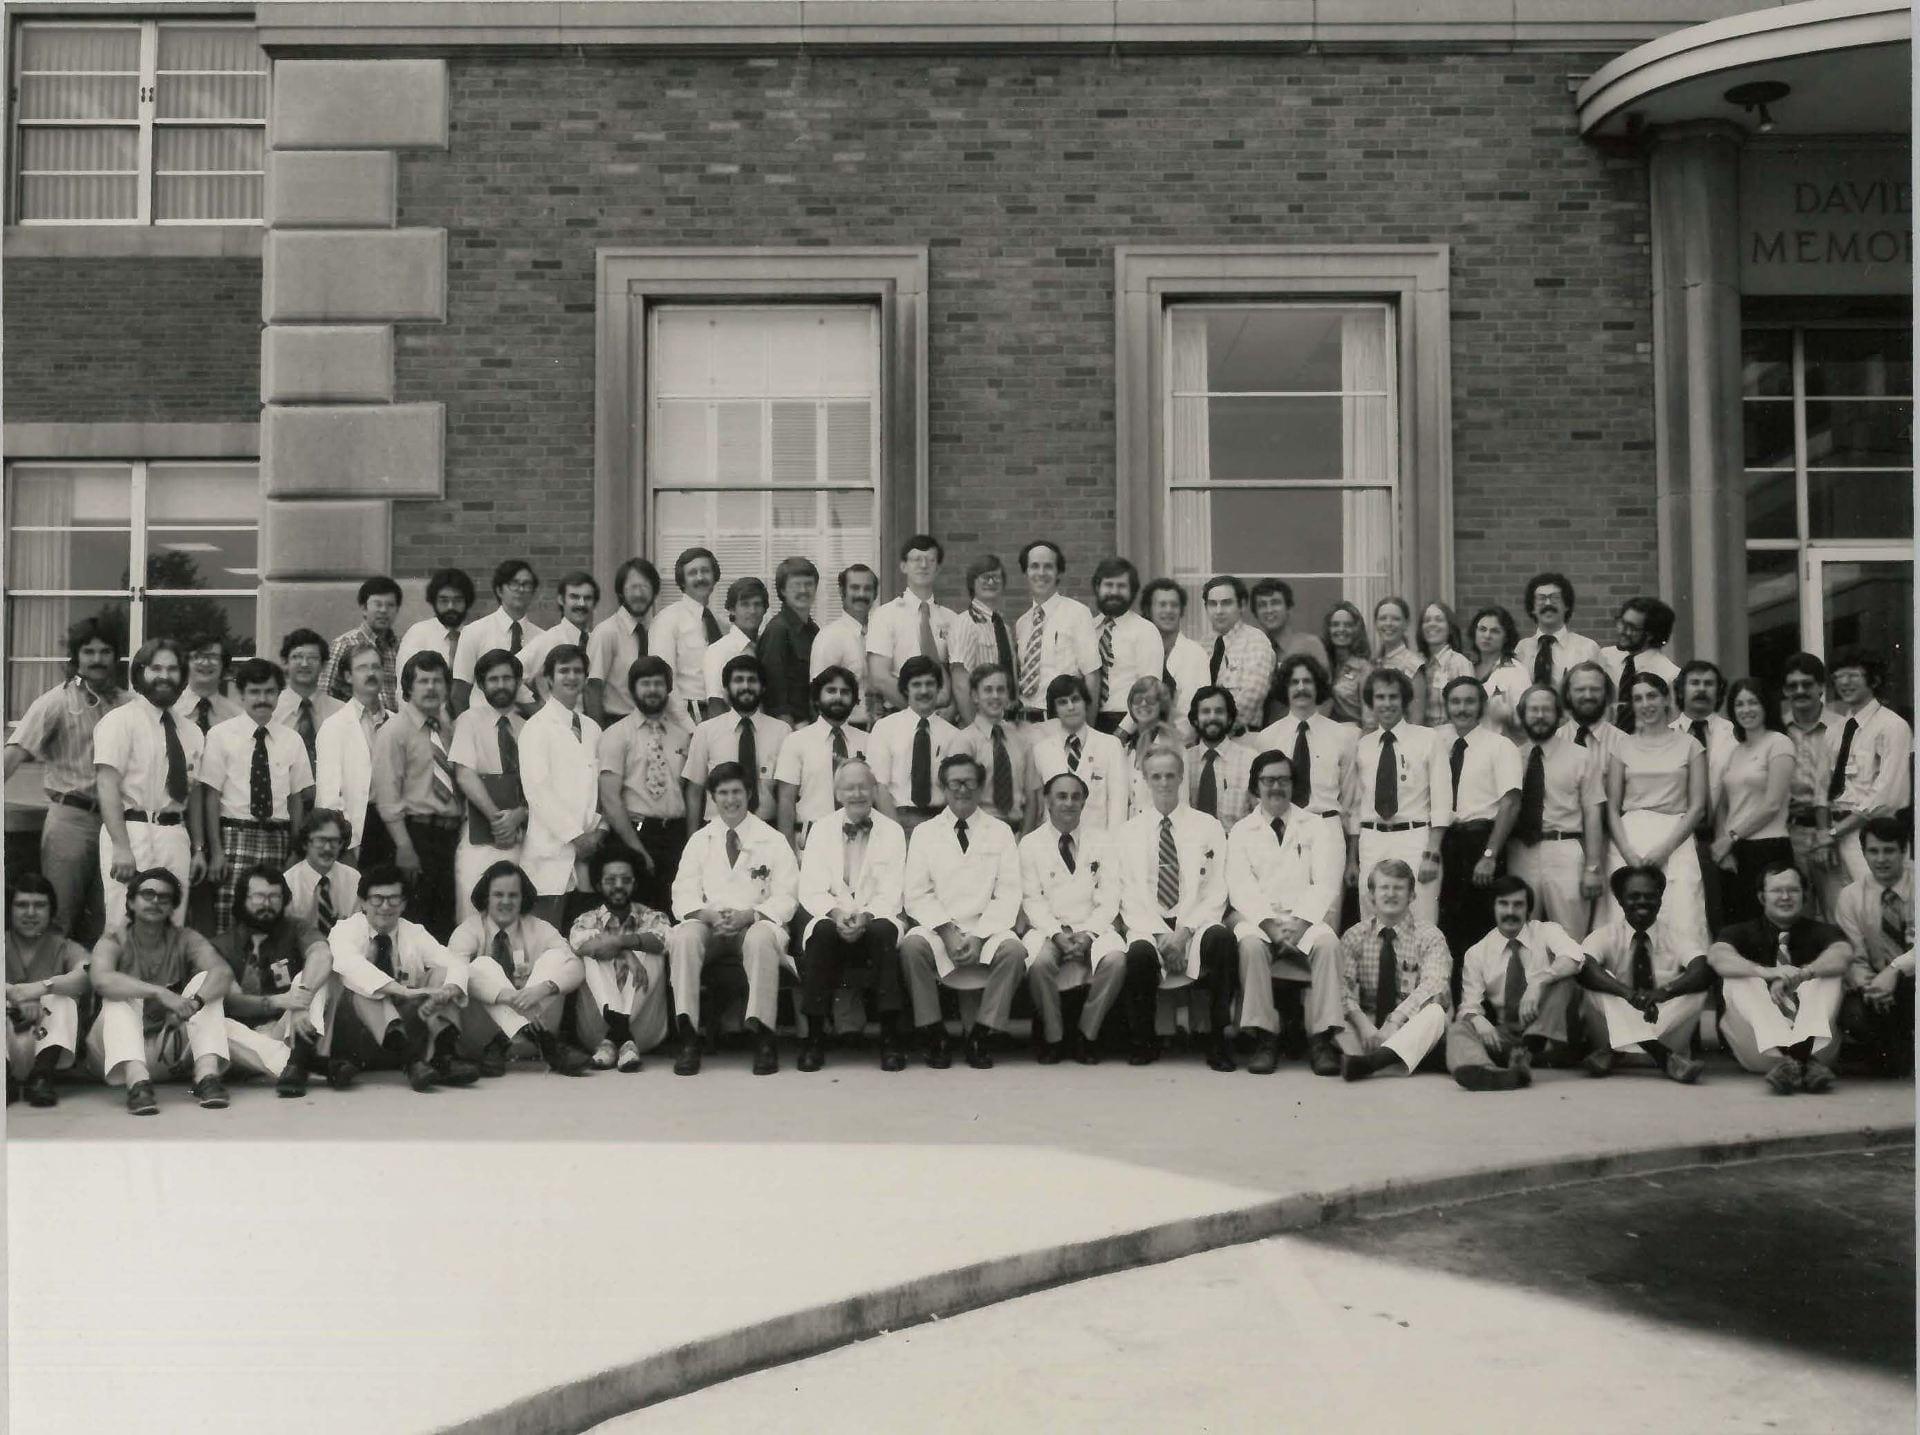 1977 Housestaff Photo